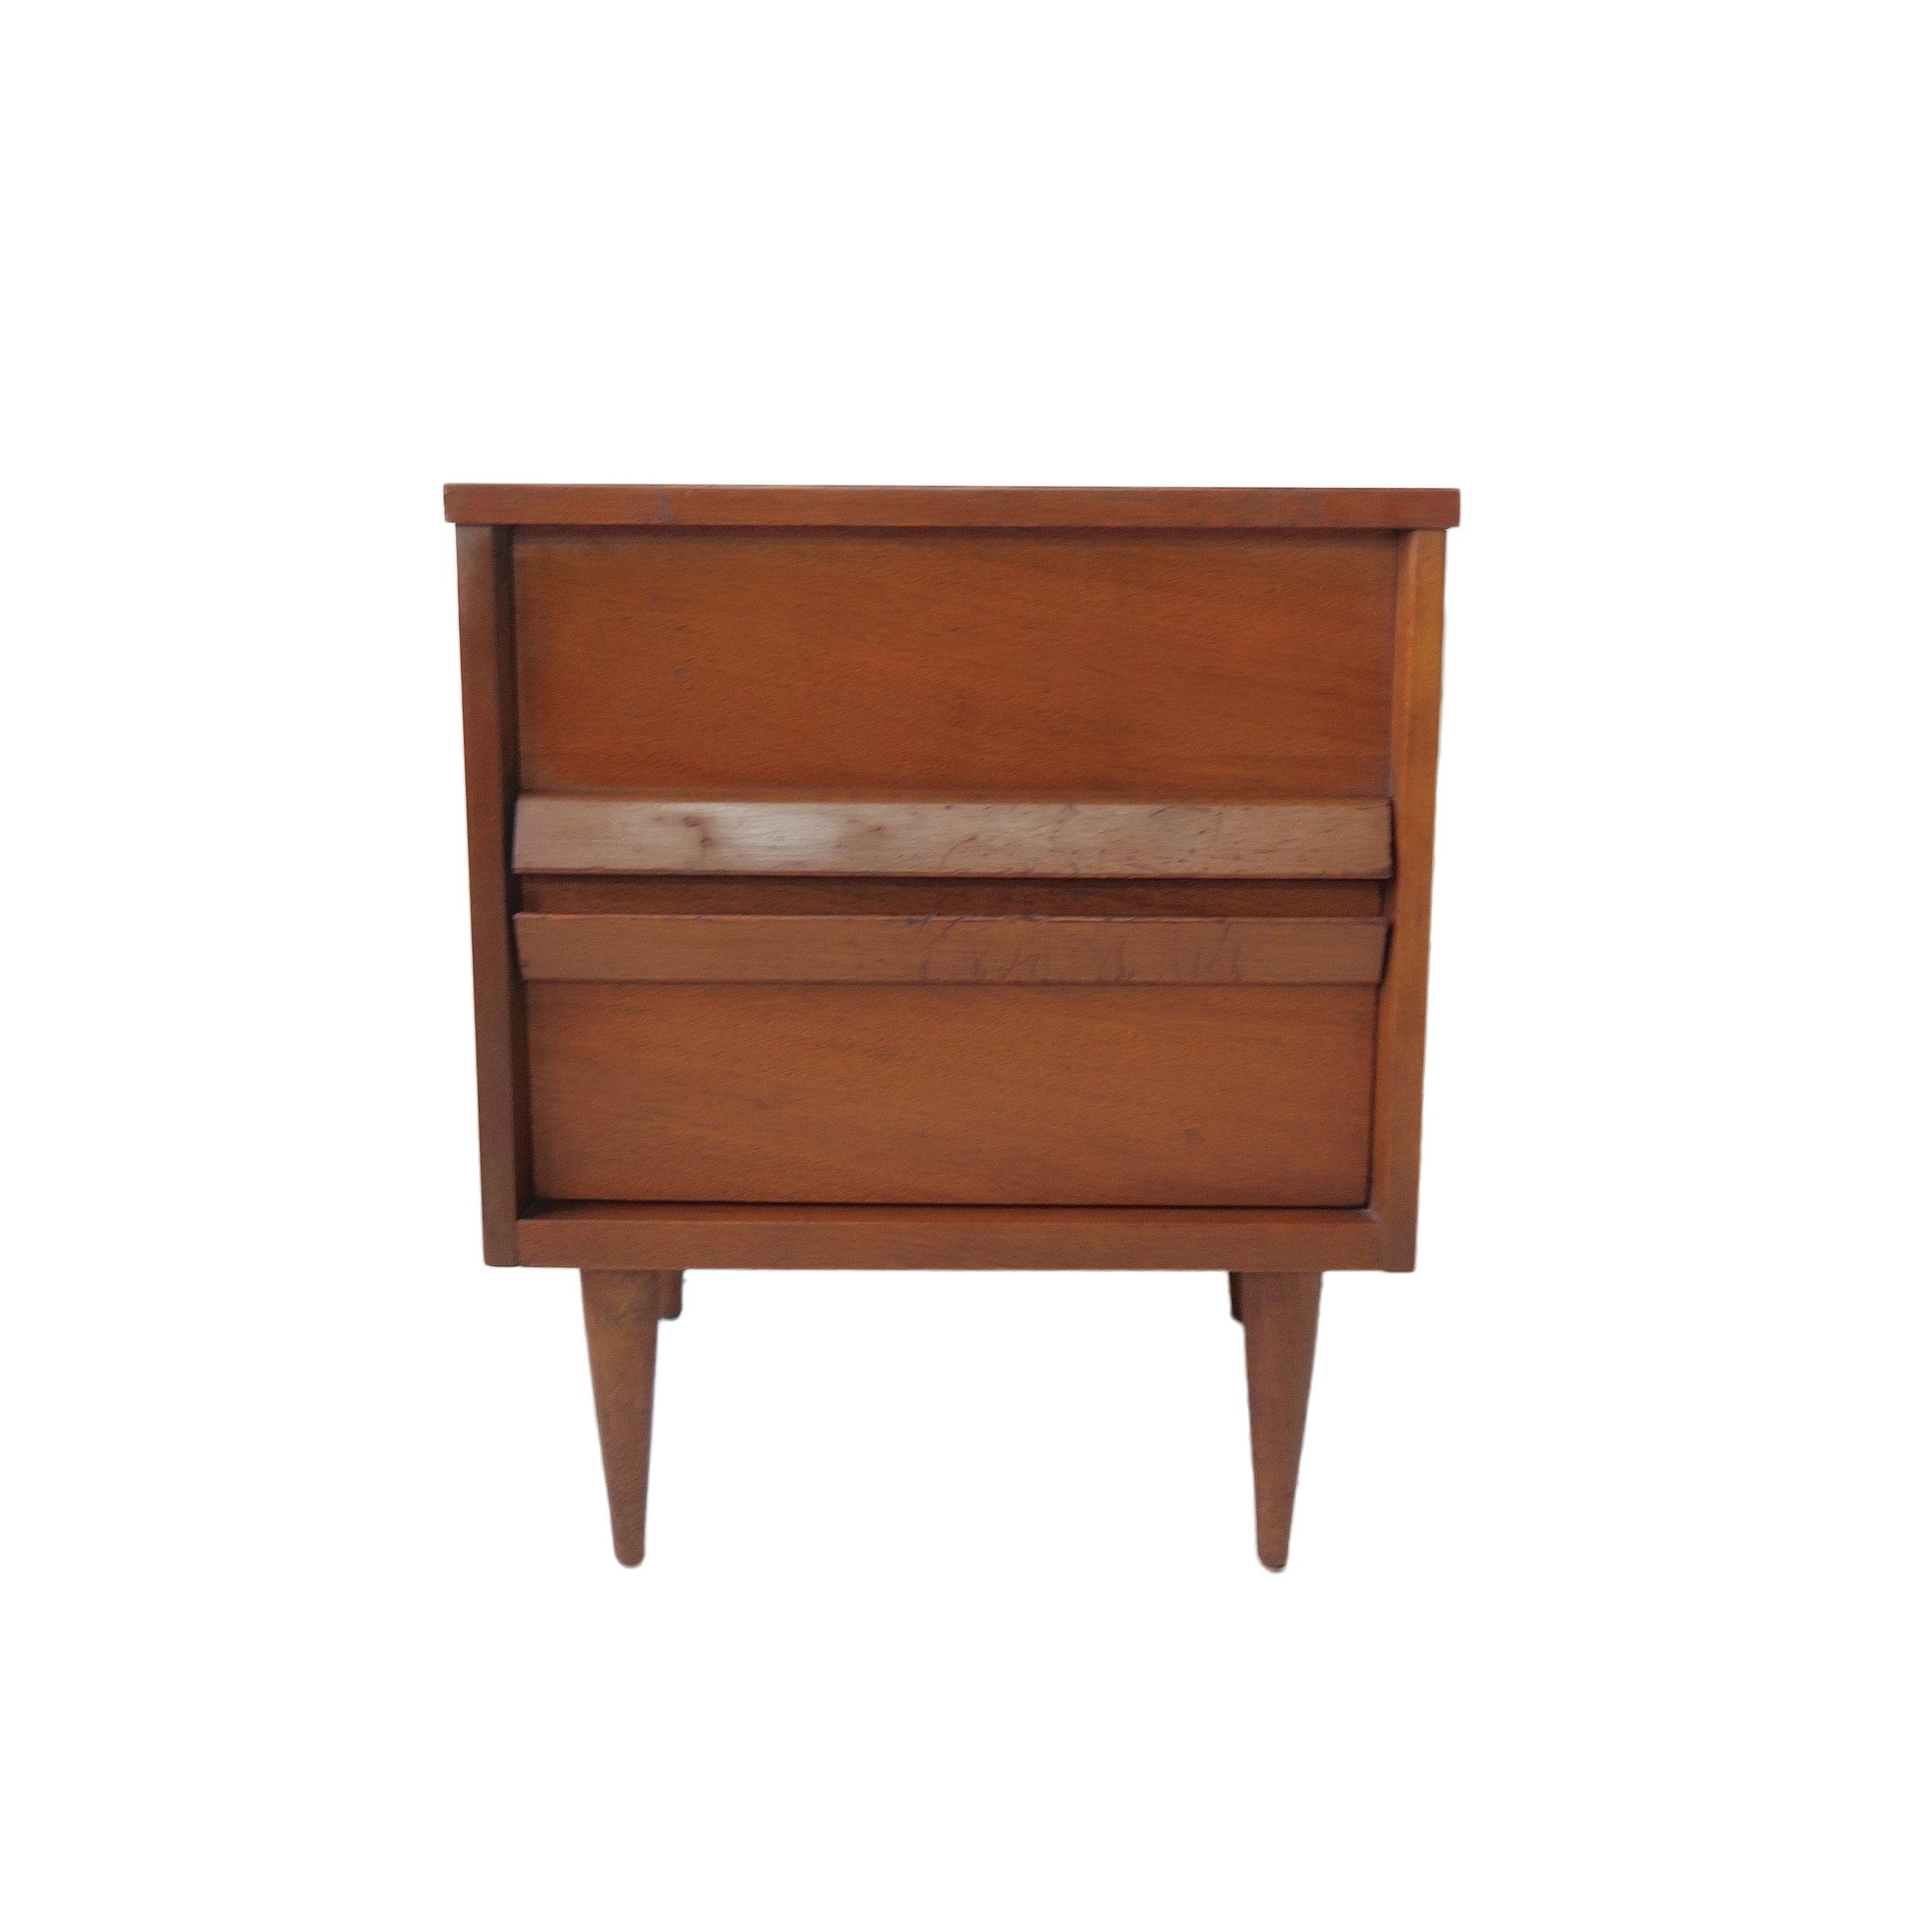 vintage bassett nightstand.jpg